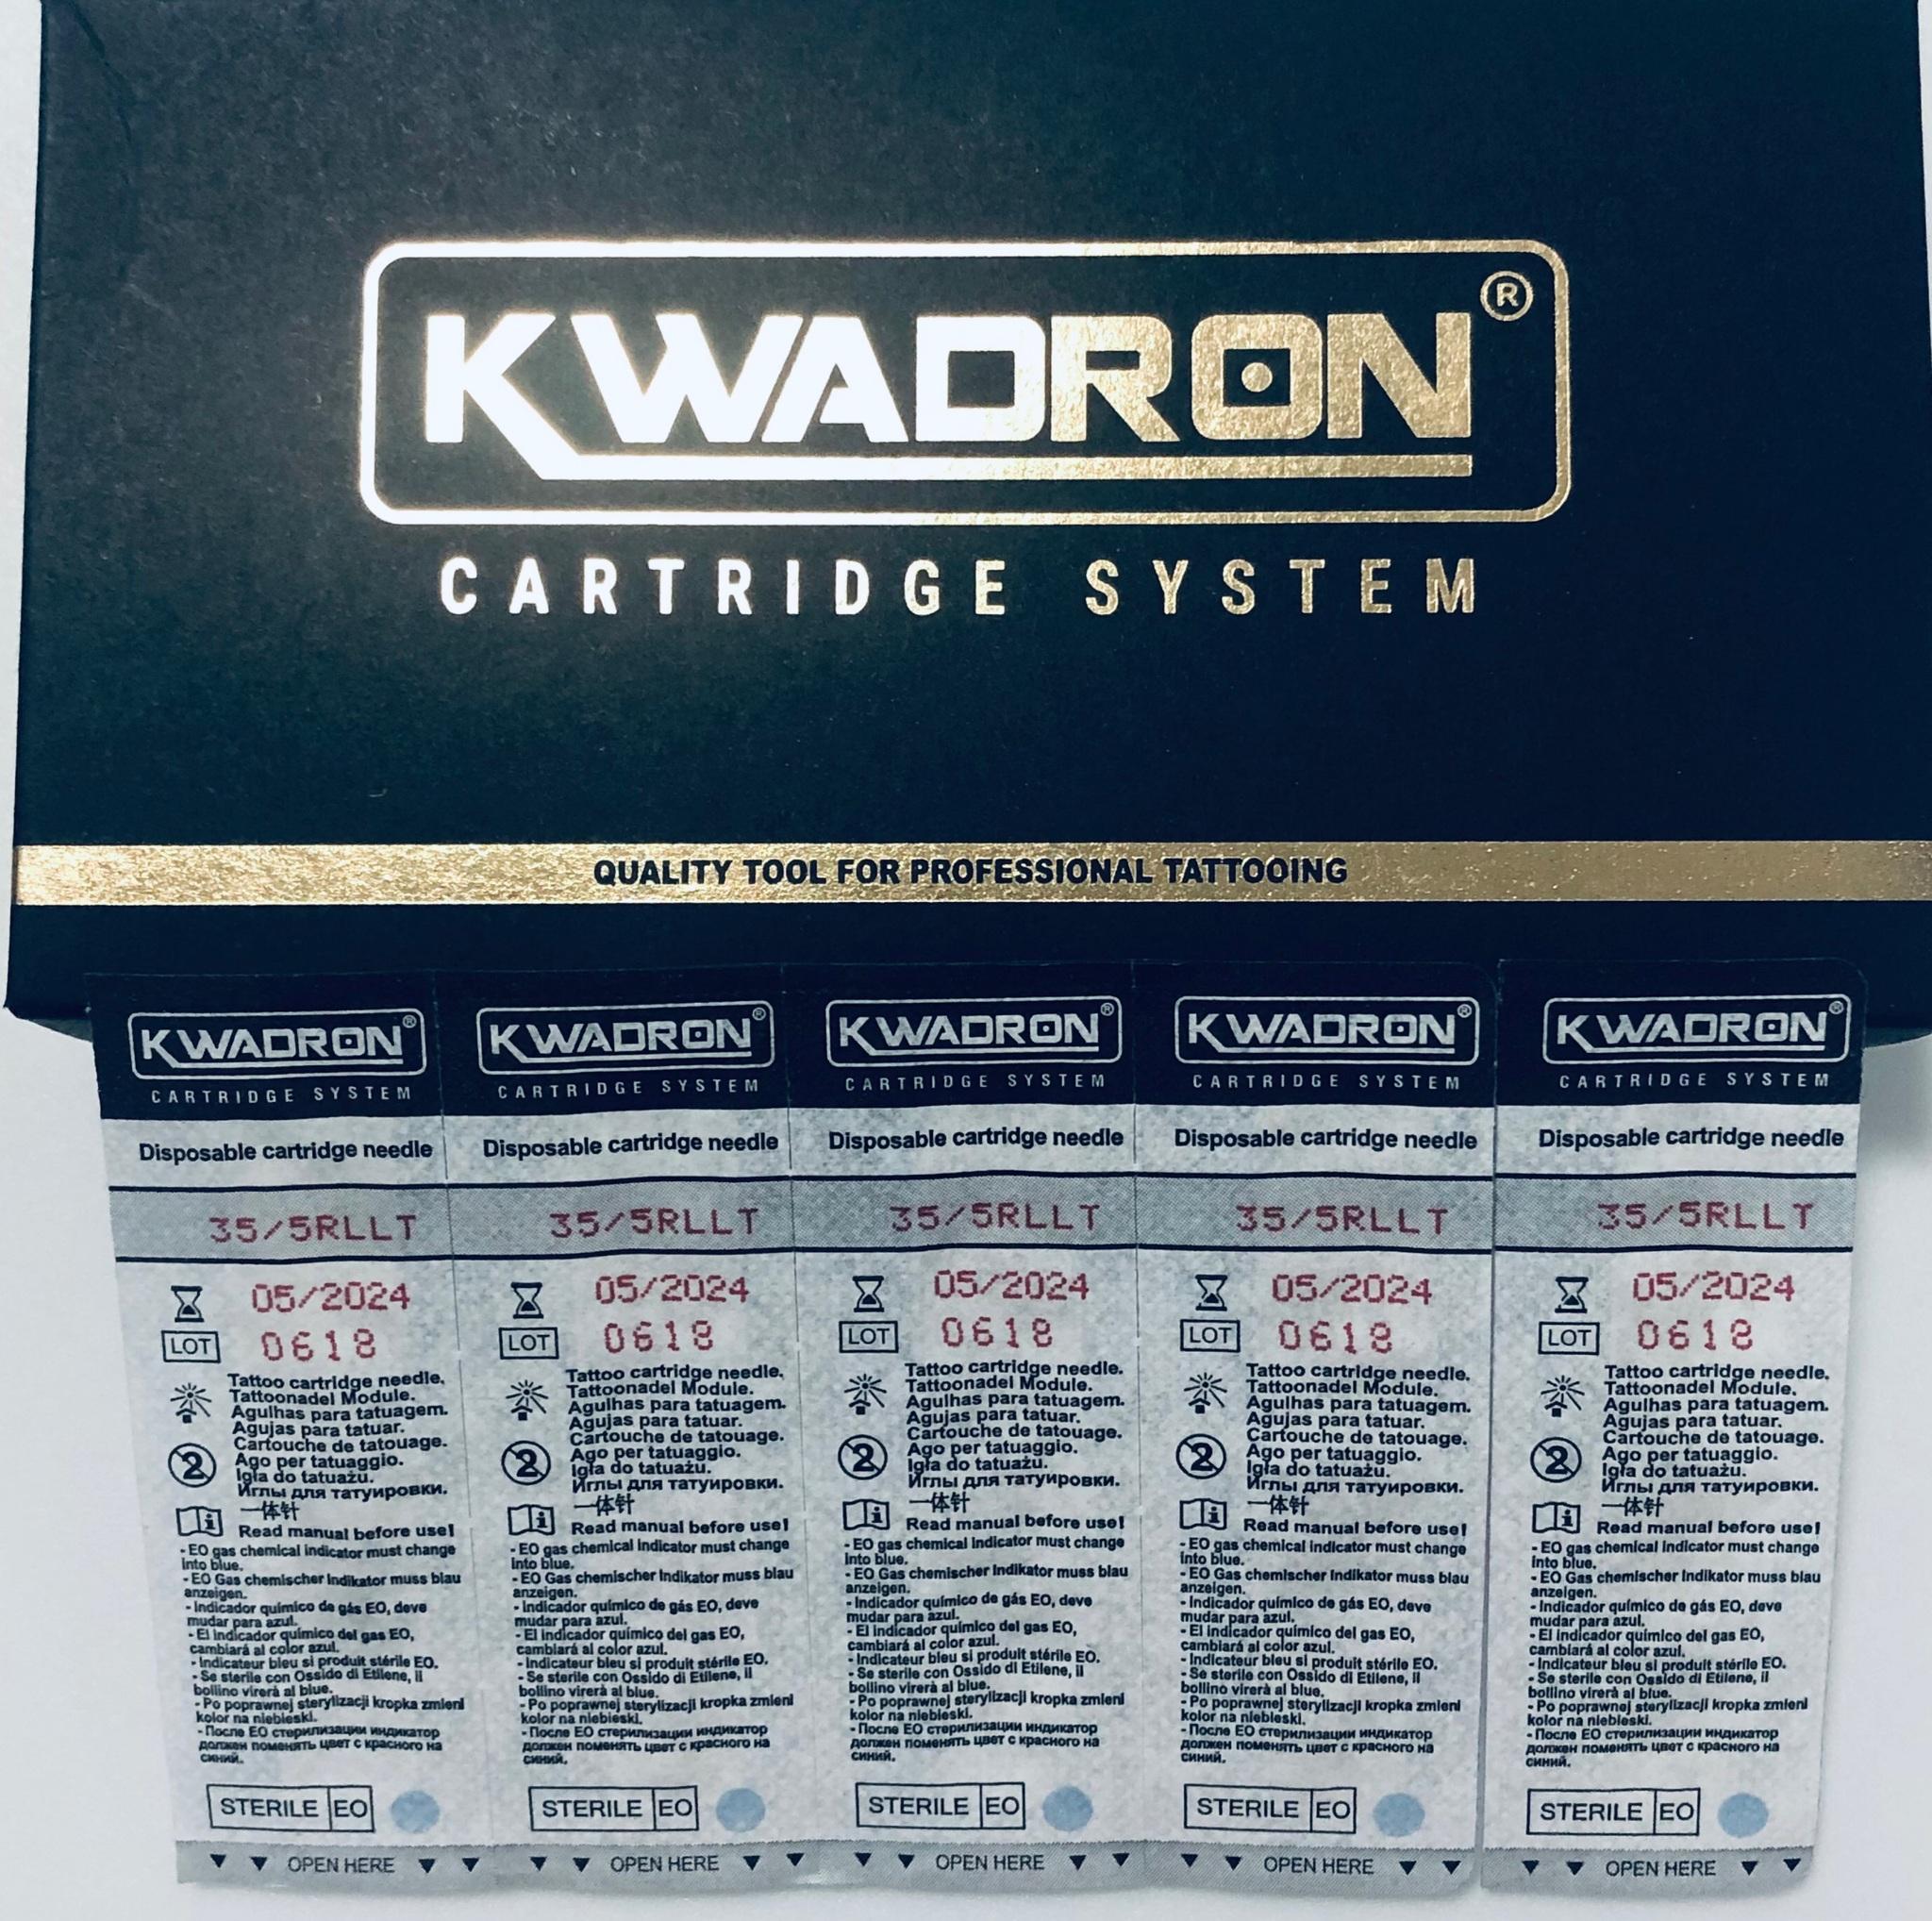 """KWADRON Round Liner 30/5RLLT -20 шт упаковка. Модули для татуажа"